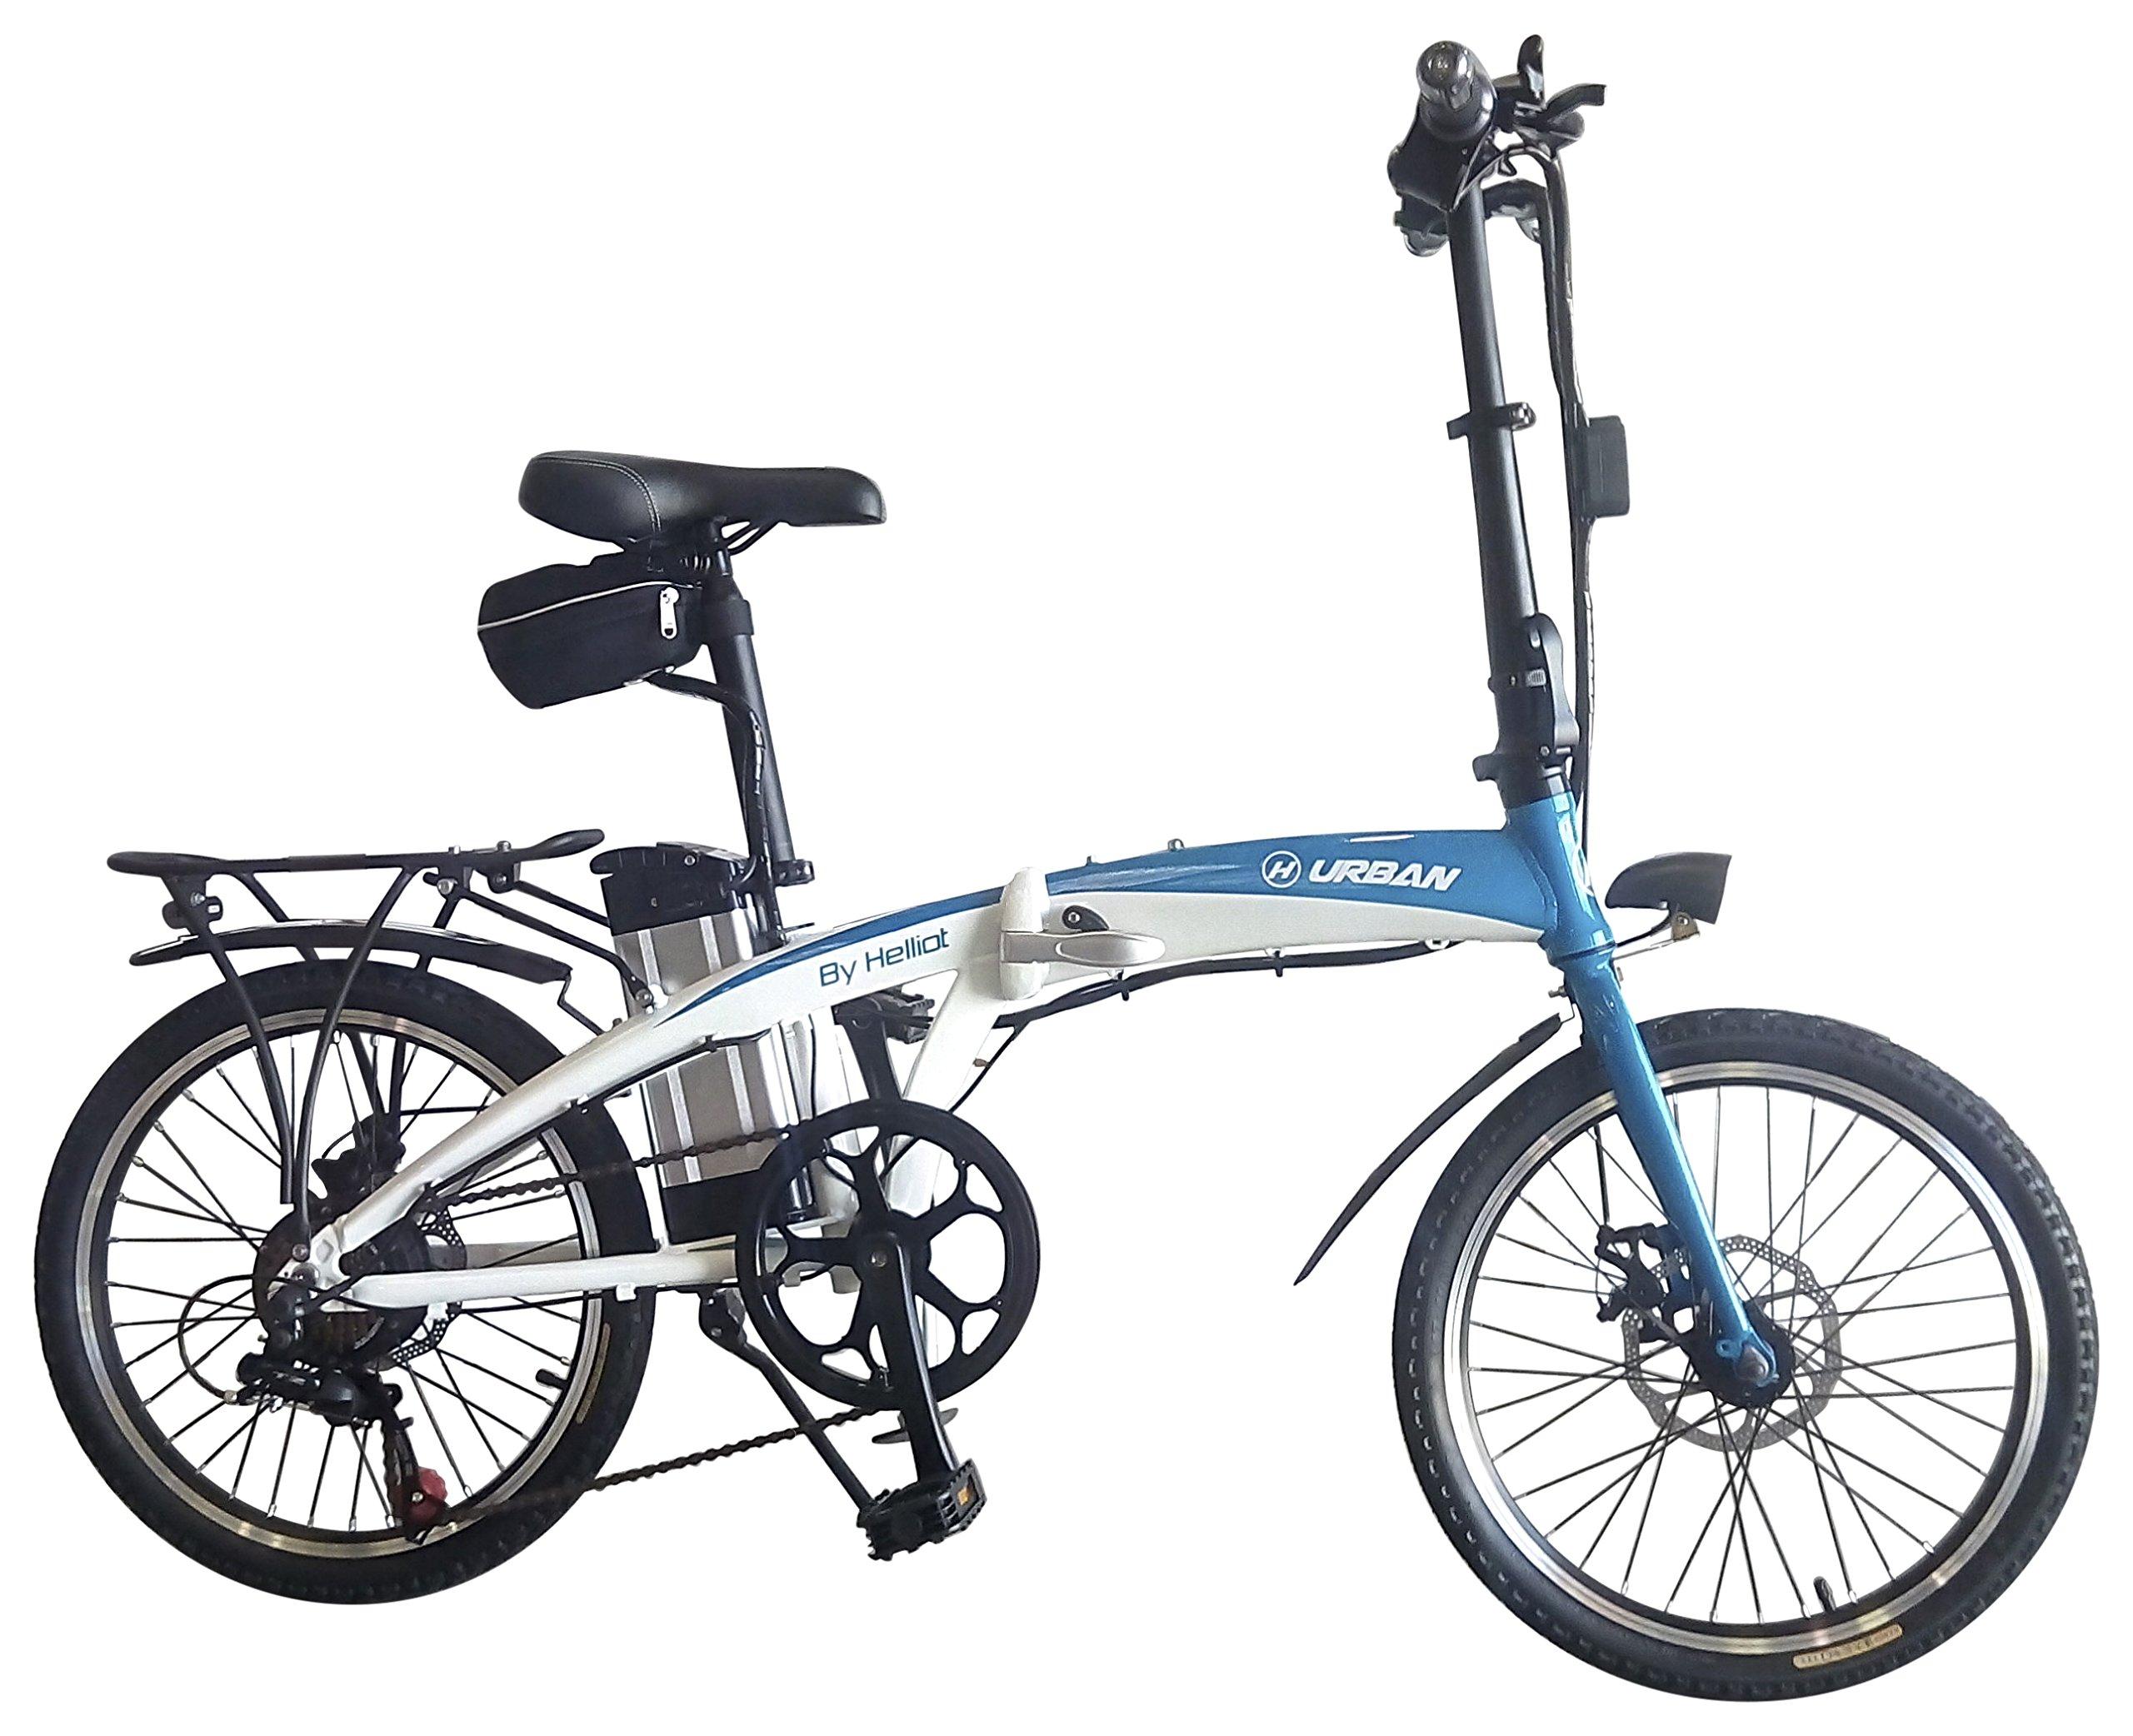 Helliot Bikes Byhell02 Bicicleta Eléctrica Plegable, Unisex Adulto, Azul/Blanco, Estándar product